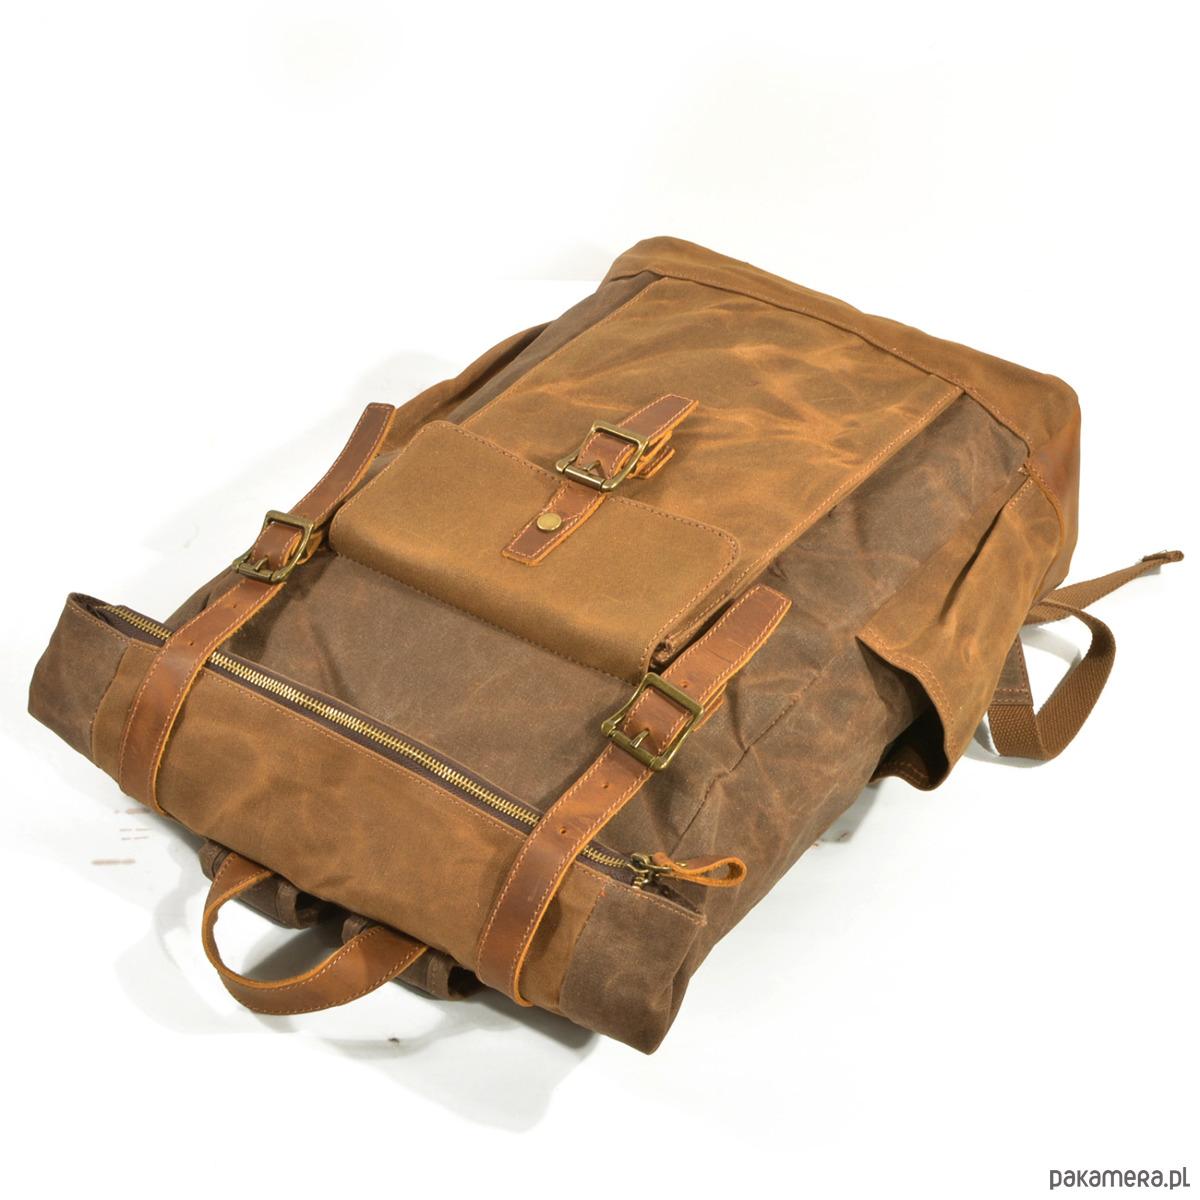 632ed4499125b P8 WAX STANFORD UNISEX™ plecak płótno wosk. - plecaki - Pakamera.pl